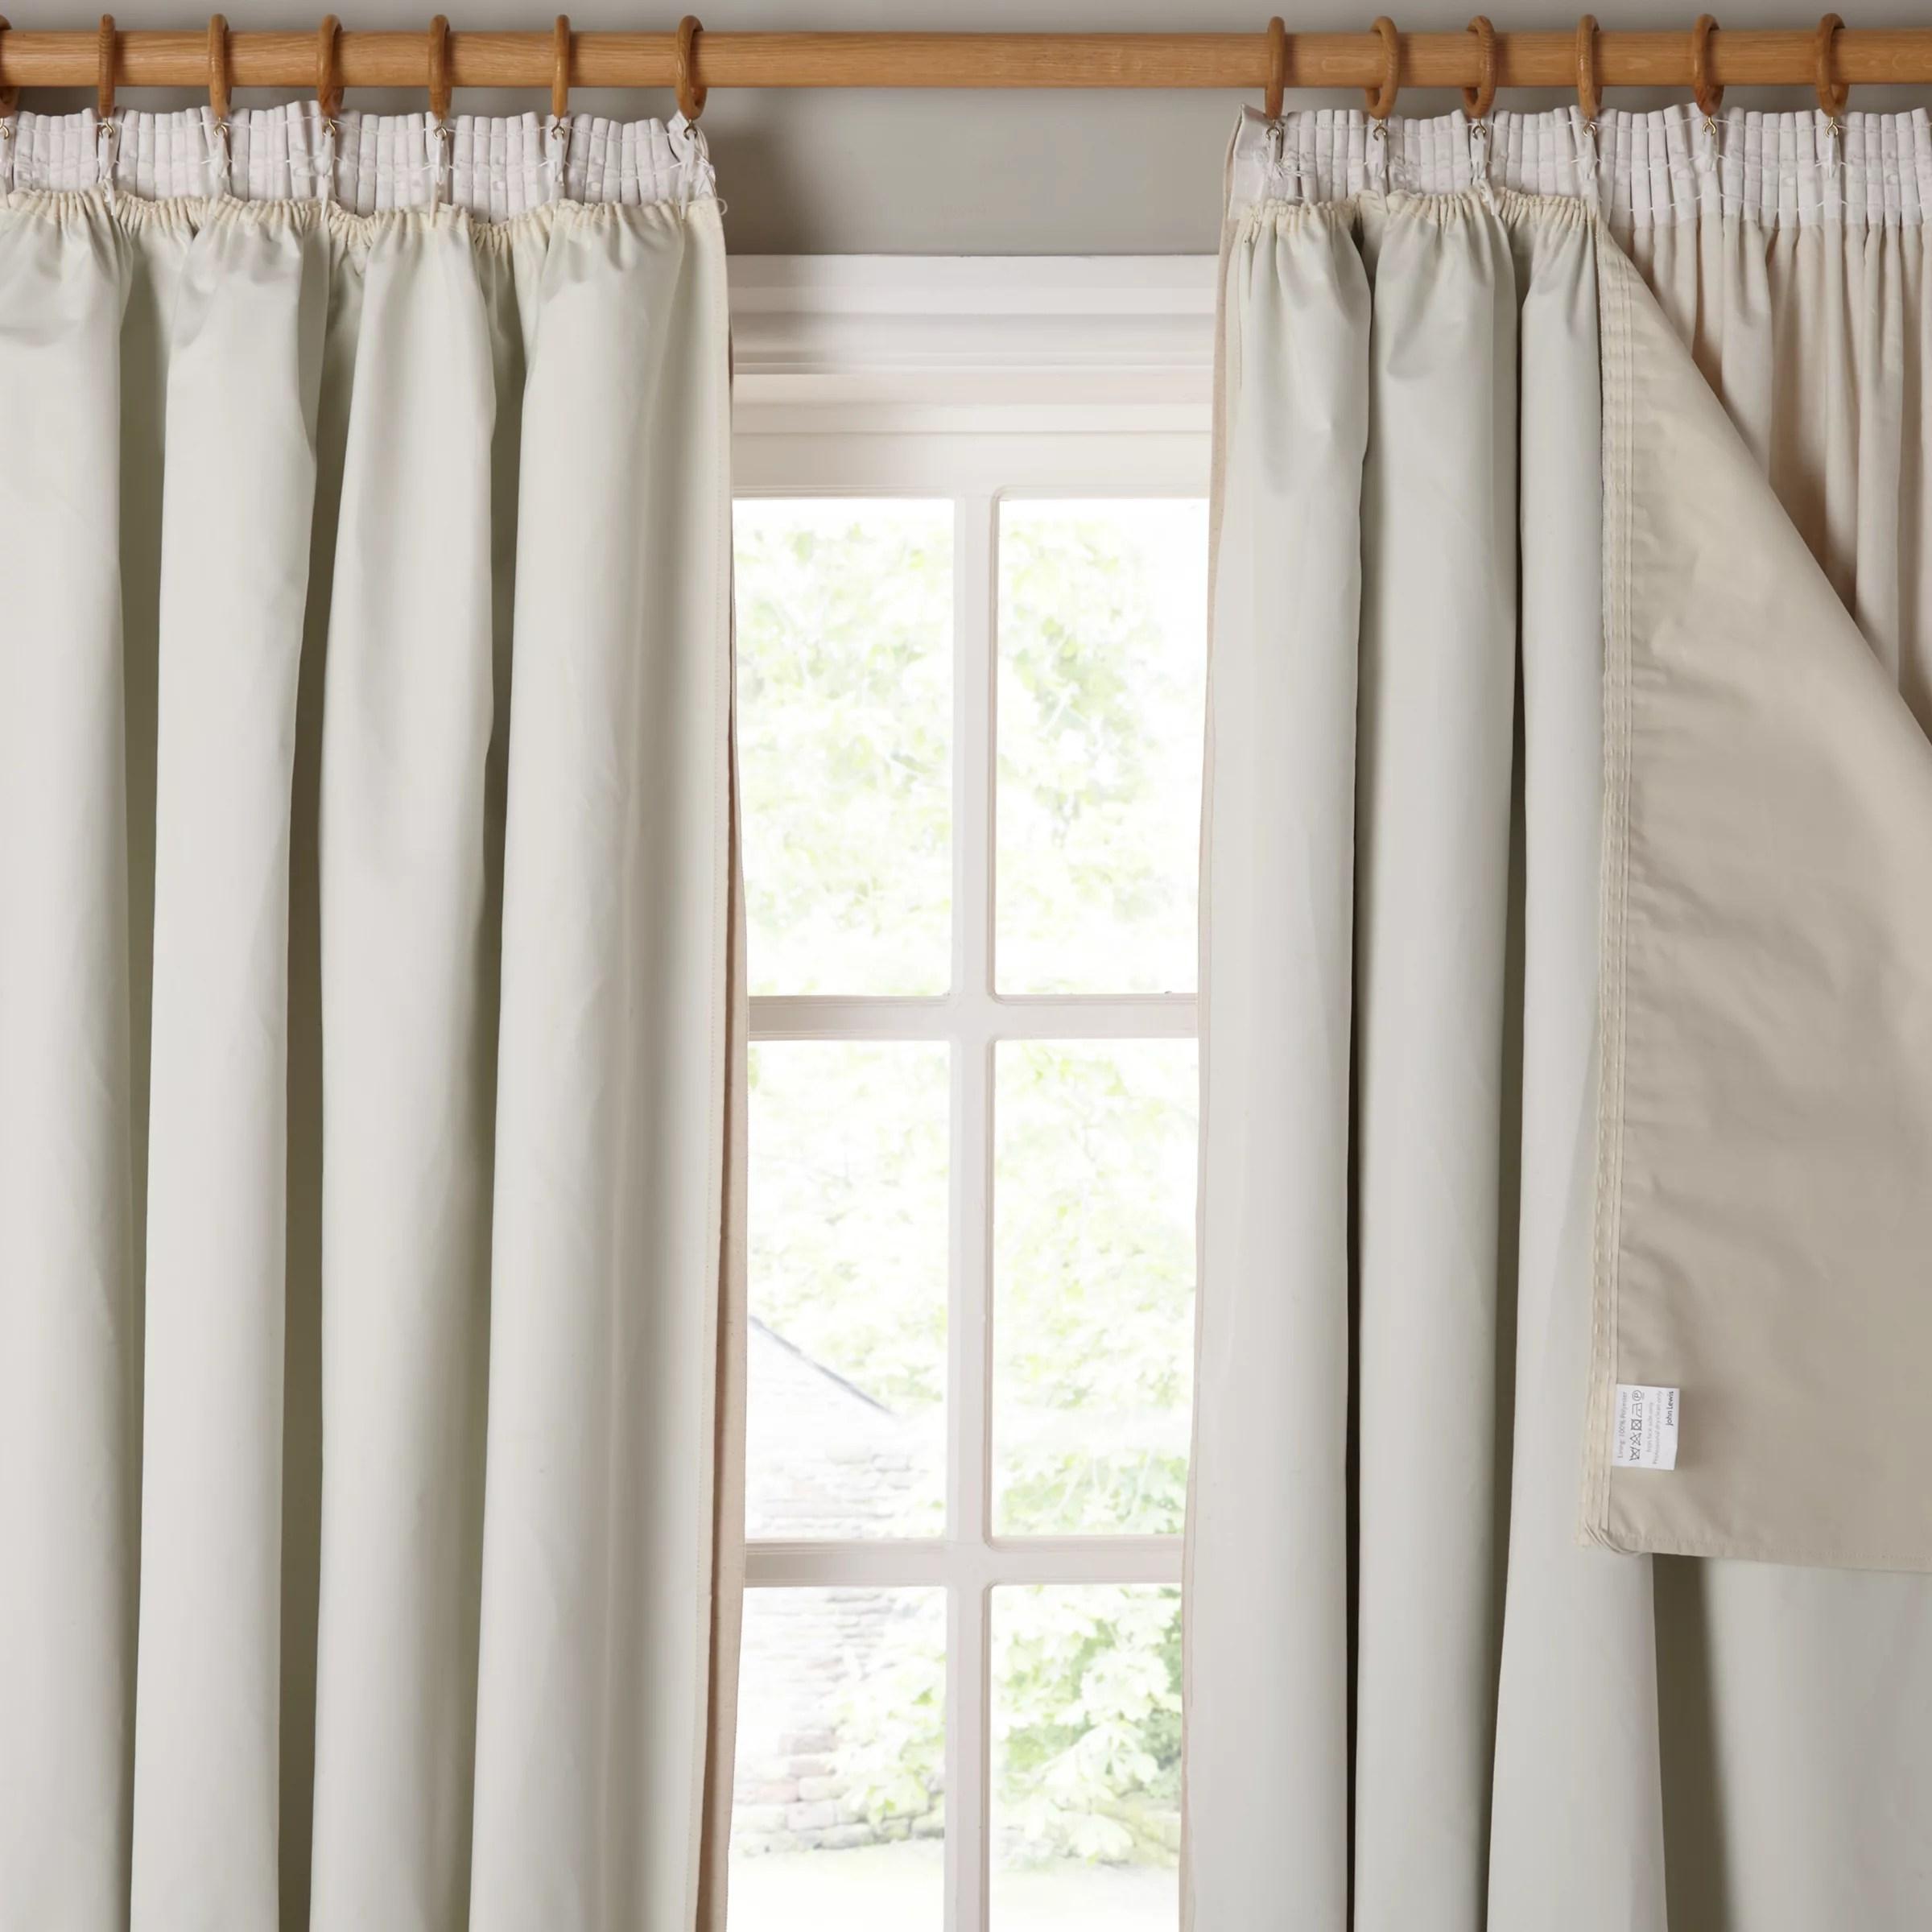 Buy John Lewis Pencil Pleat Blackout Curtain Linings Ivory John